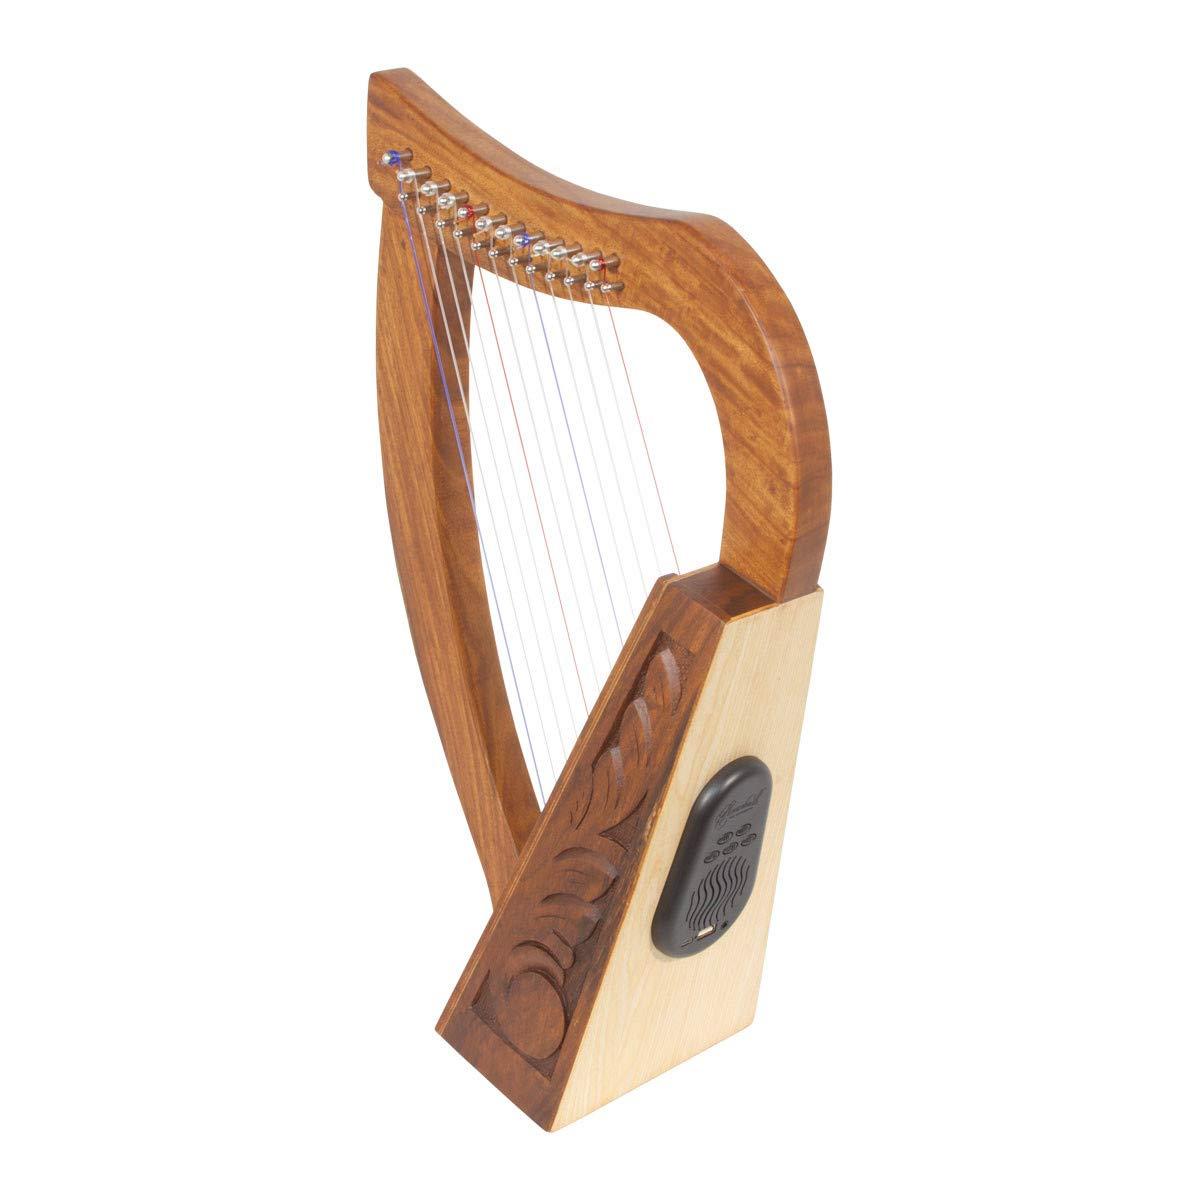 Roosebeck 12-String Celtic Baby Harp w/Bluetooth Speaker